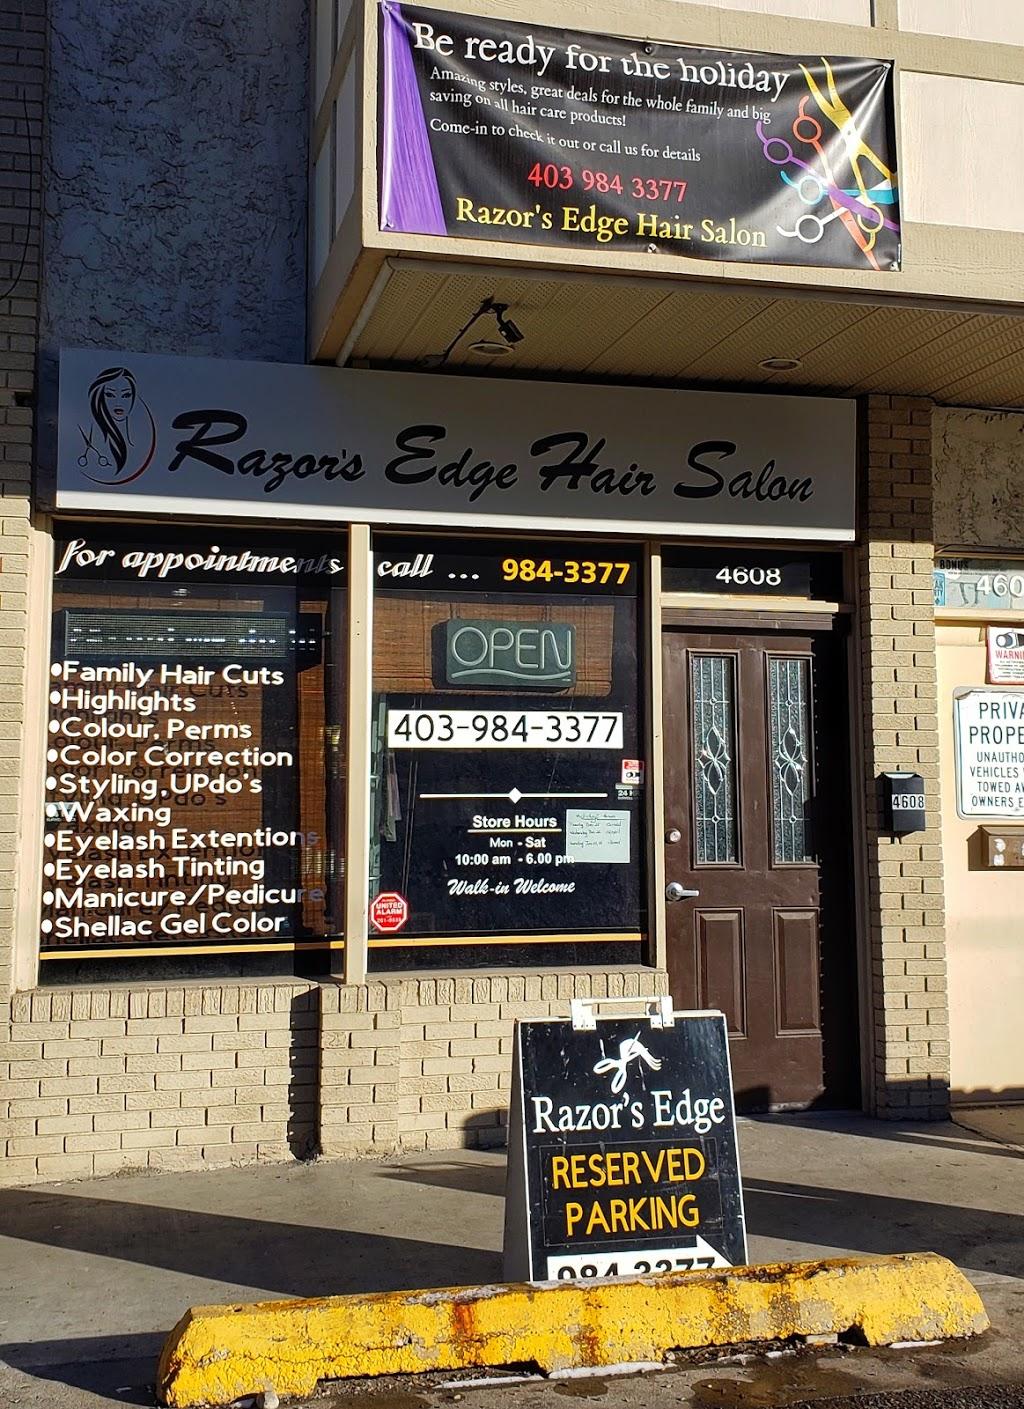 Razors Edge Hair Salon   hair care   4608 Bowness Rd NW, Calgary, AB T3B 0B3, Canada   4039843377 OR +1 403-984-3377